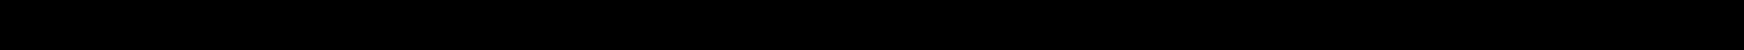 hgfbkit-webfont.ttf